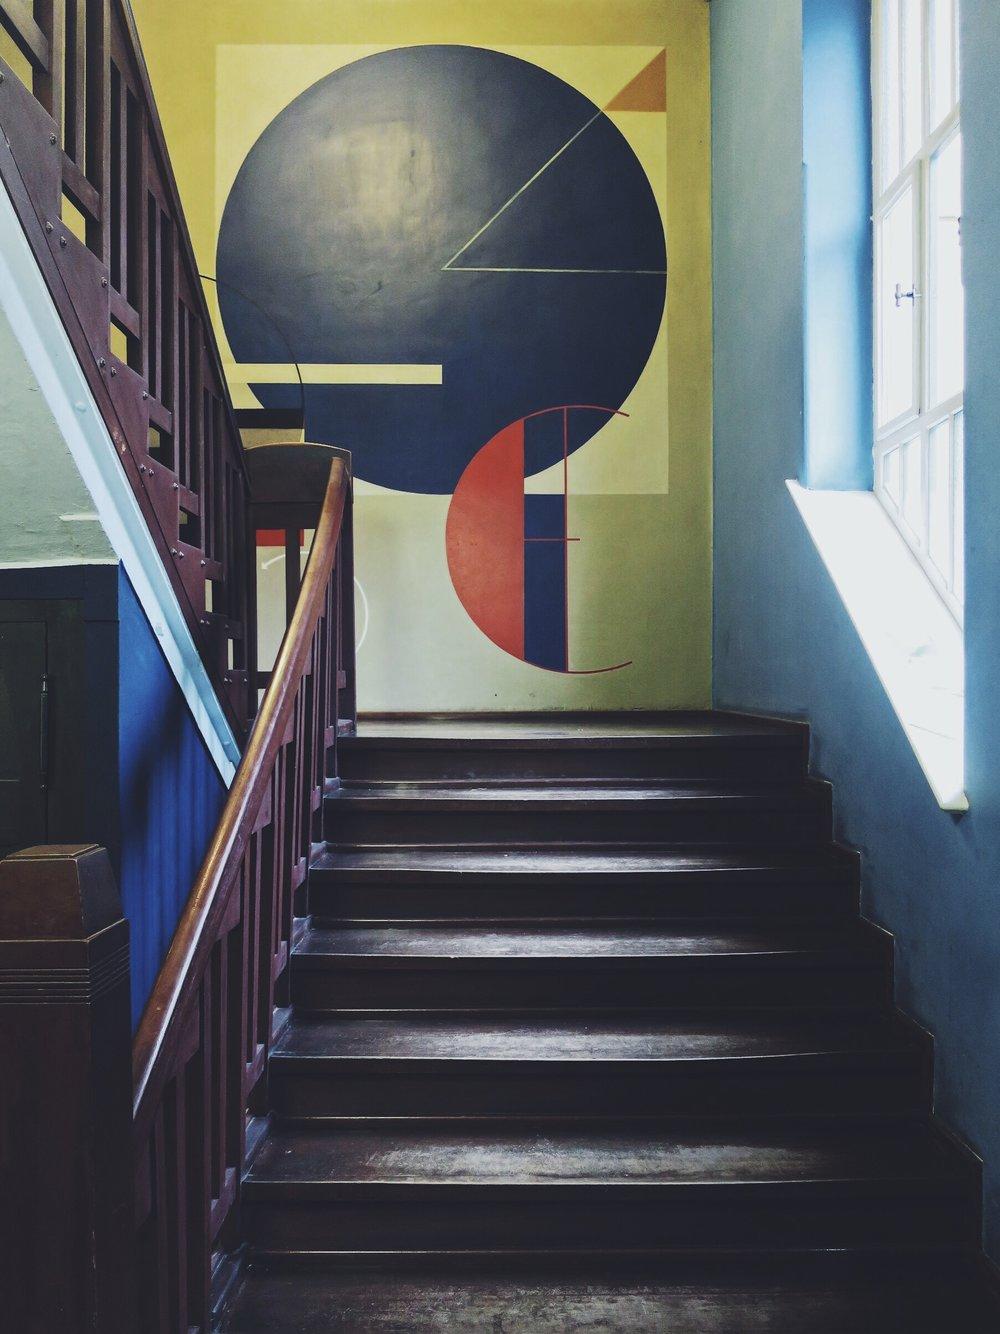 Wall painting inside the Bauhaus University, Weimar